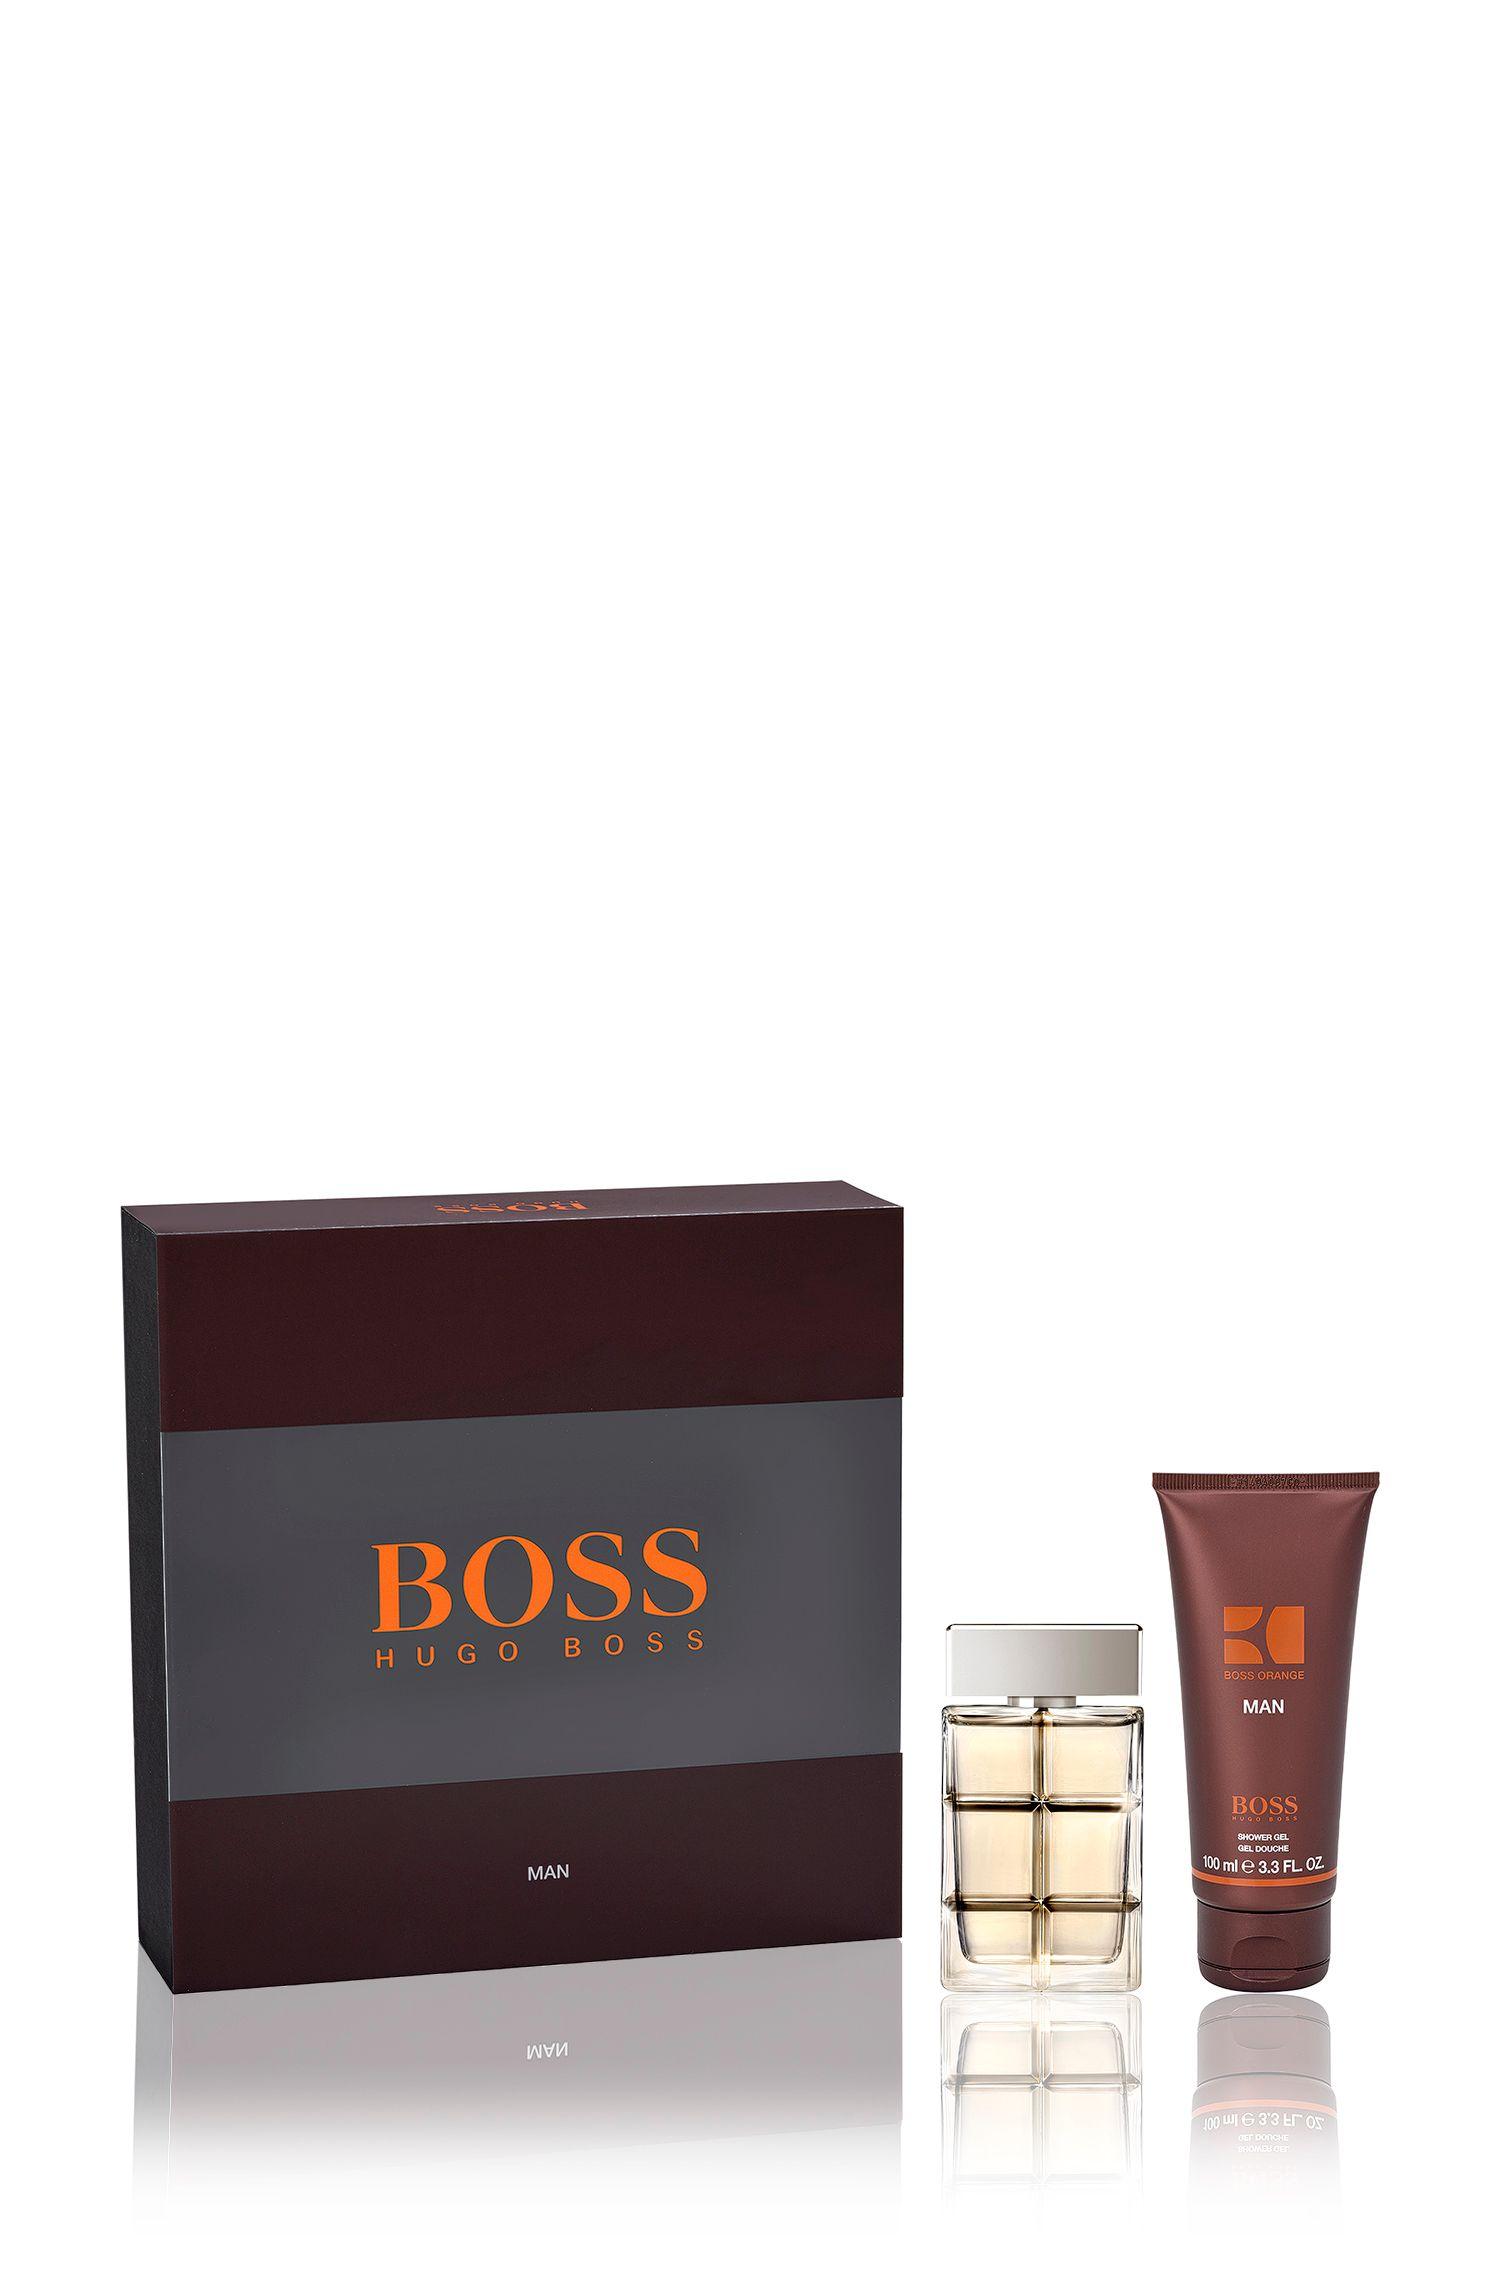 Set de regalo 'BOSS Orange Man' con Eau de Toilette 40ml y gel de ducha